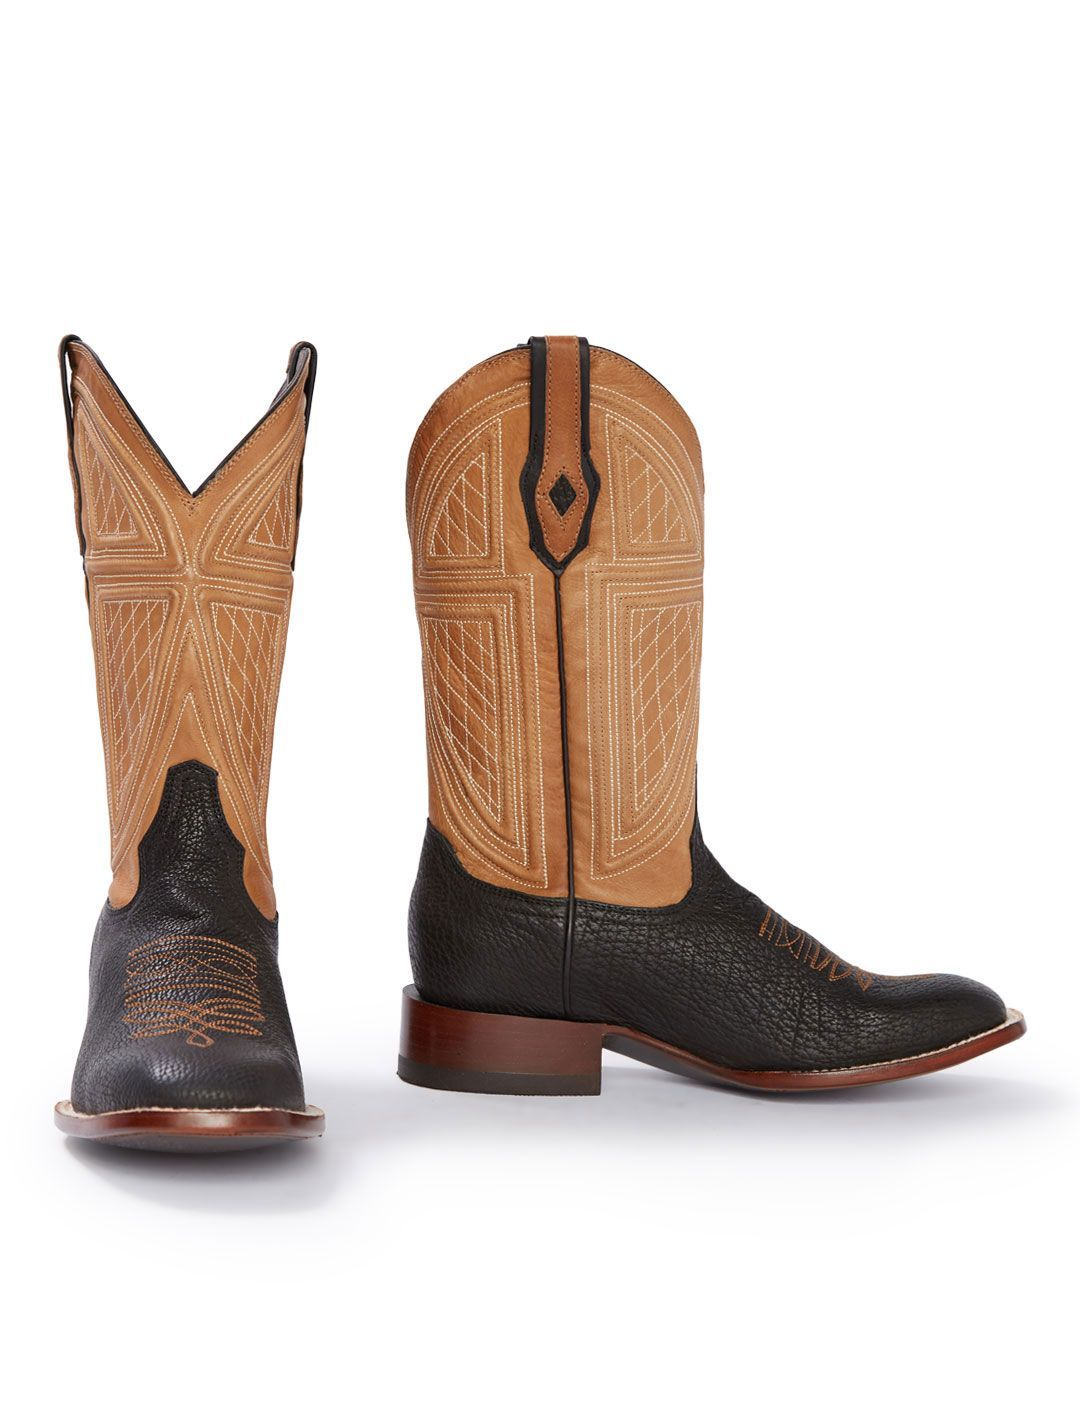 e1d64886fef Stetson Men s Billings Black Shark Cowboy Boot 12-020-1852-0360. Details